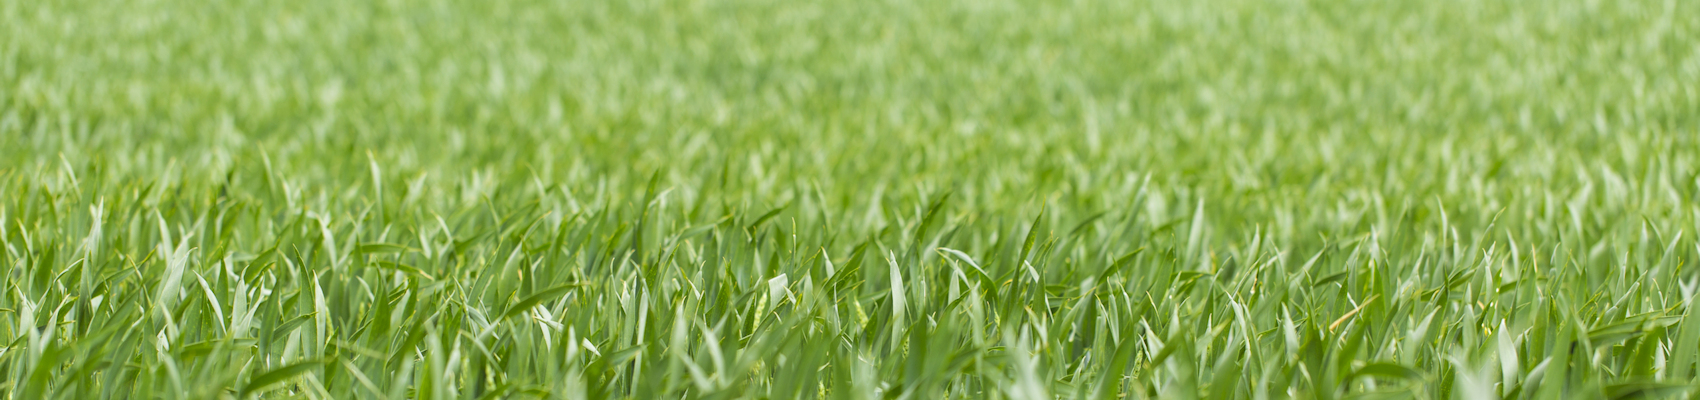 grassslide